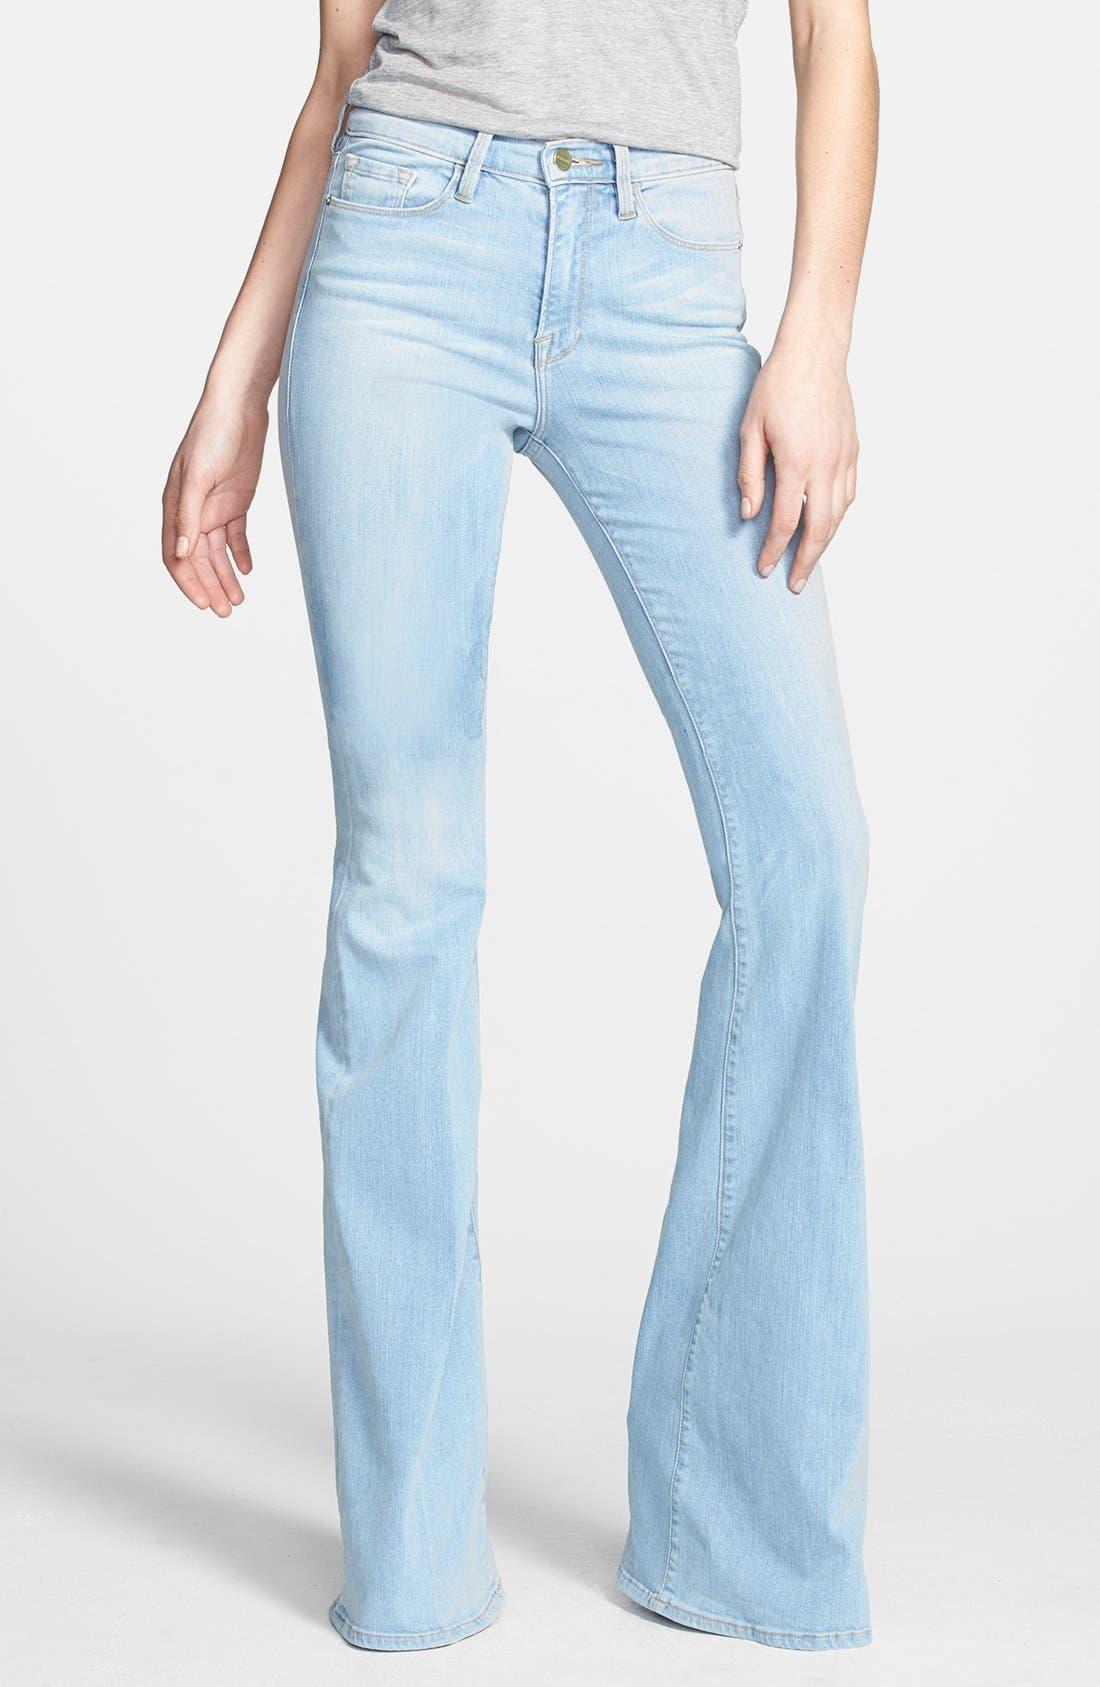 Alternate Image 2  - Frame Denim 'Forever Karlie' Flared Jeans (Redchurch Street)